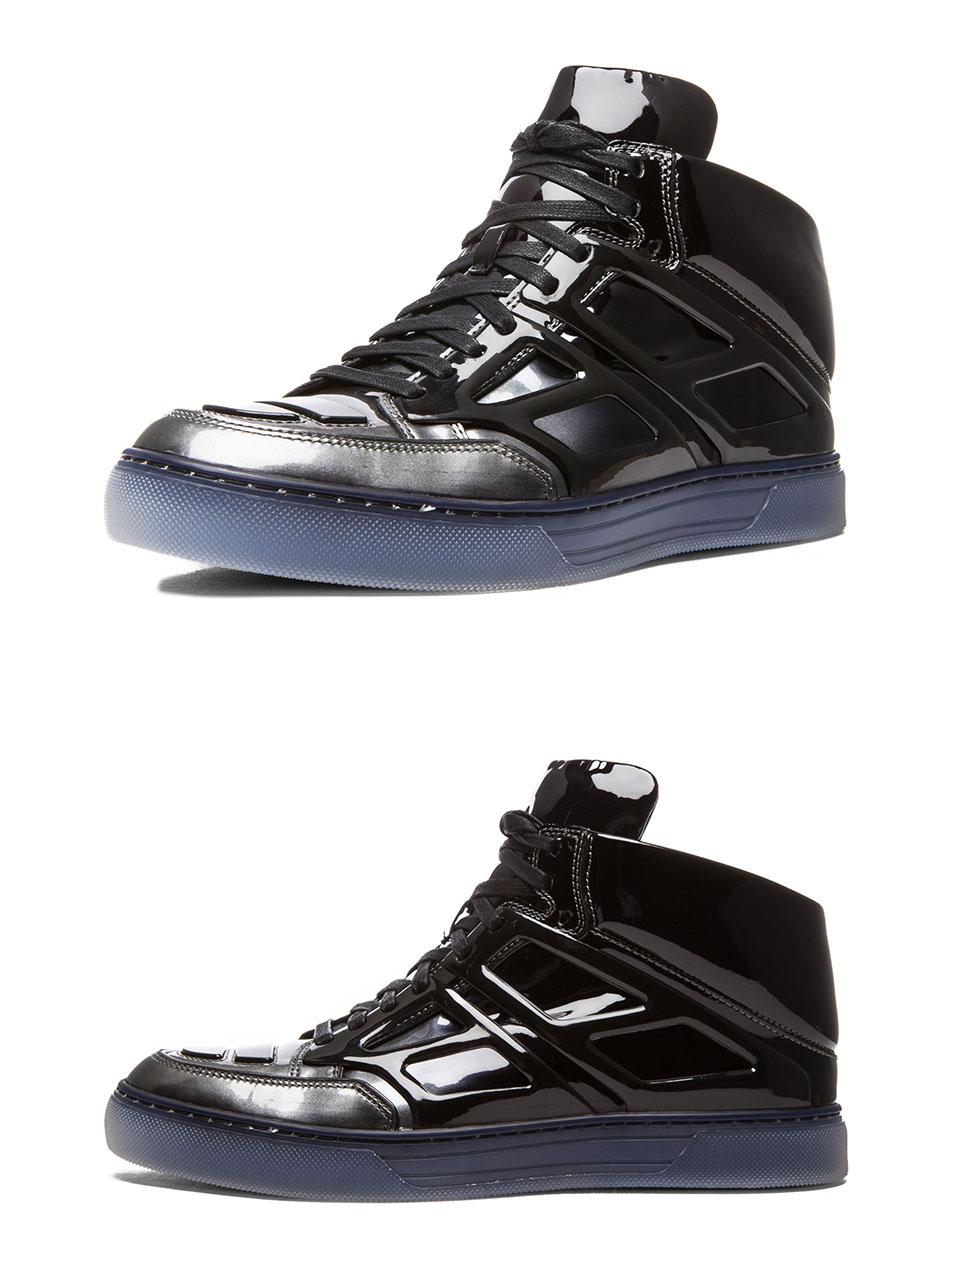 Gunmetal Tron Sneakers Mid Alejandro Ingelmo